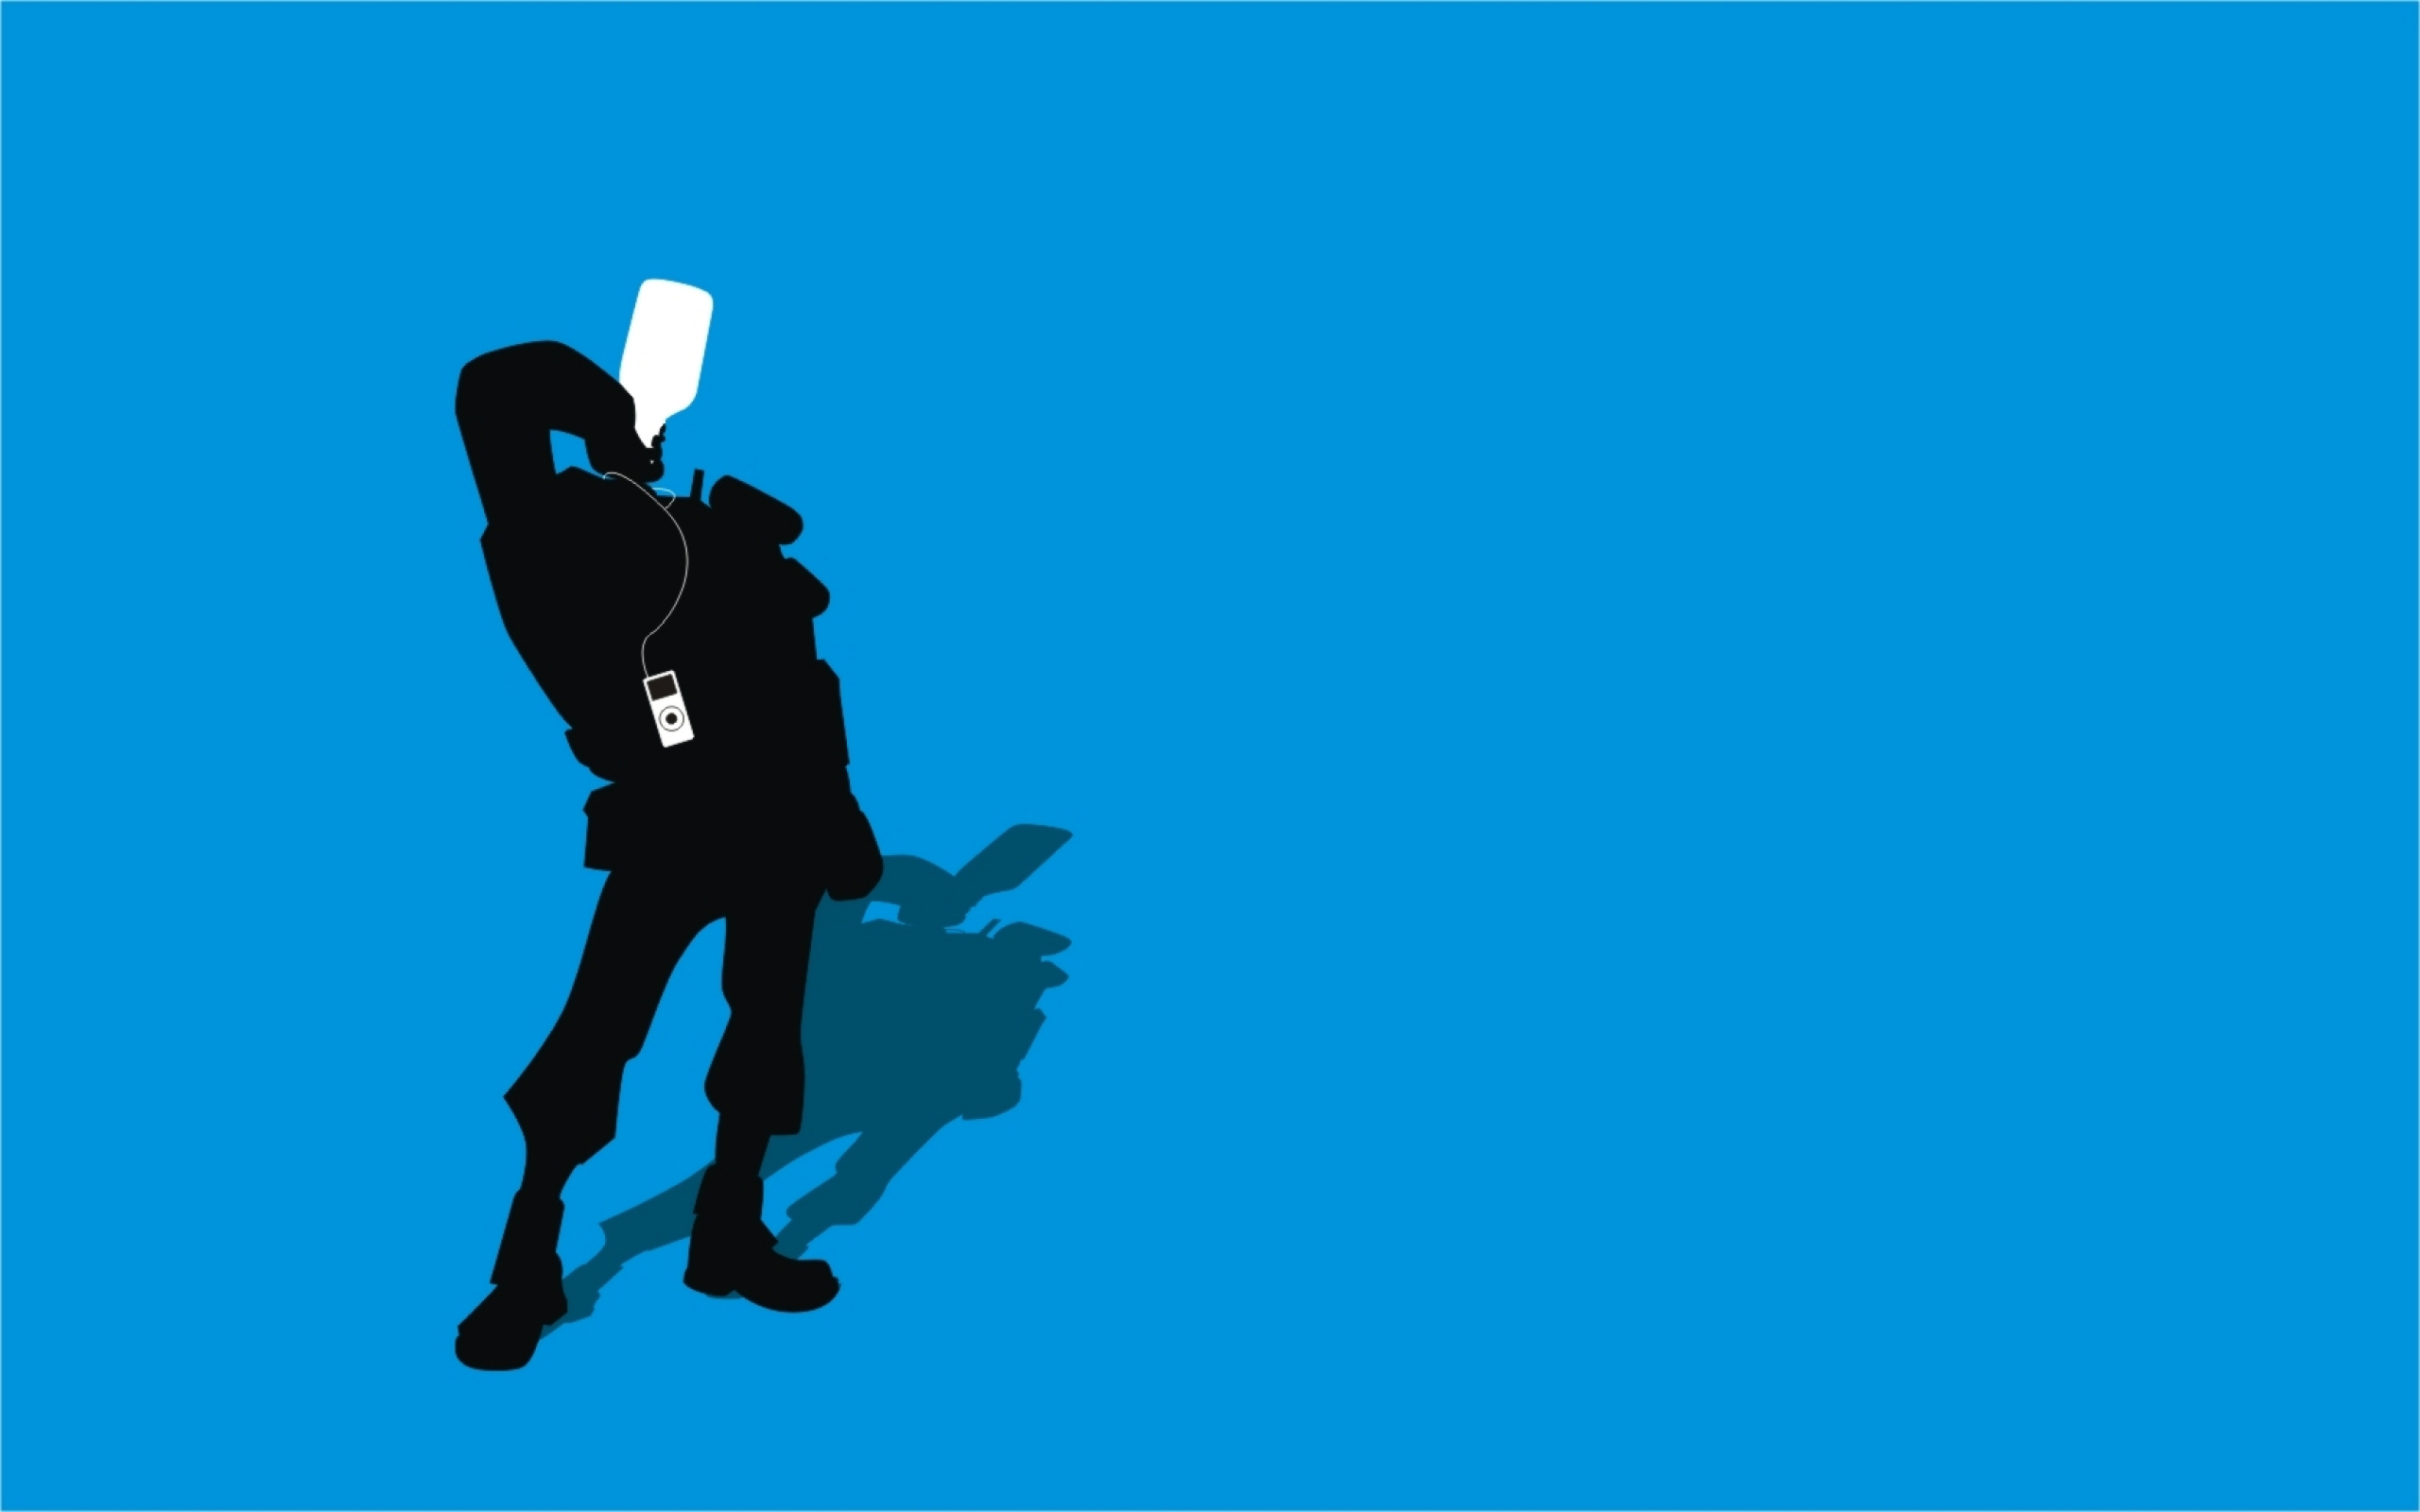 2560x1600 Tf2 Blue Demoman Silhouette Ipod Earbuds 2560x1600 By Cwegrecki